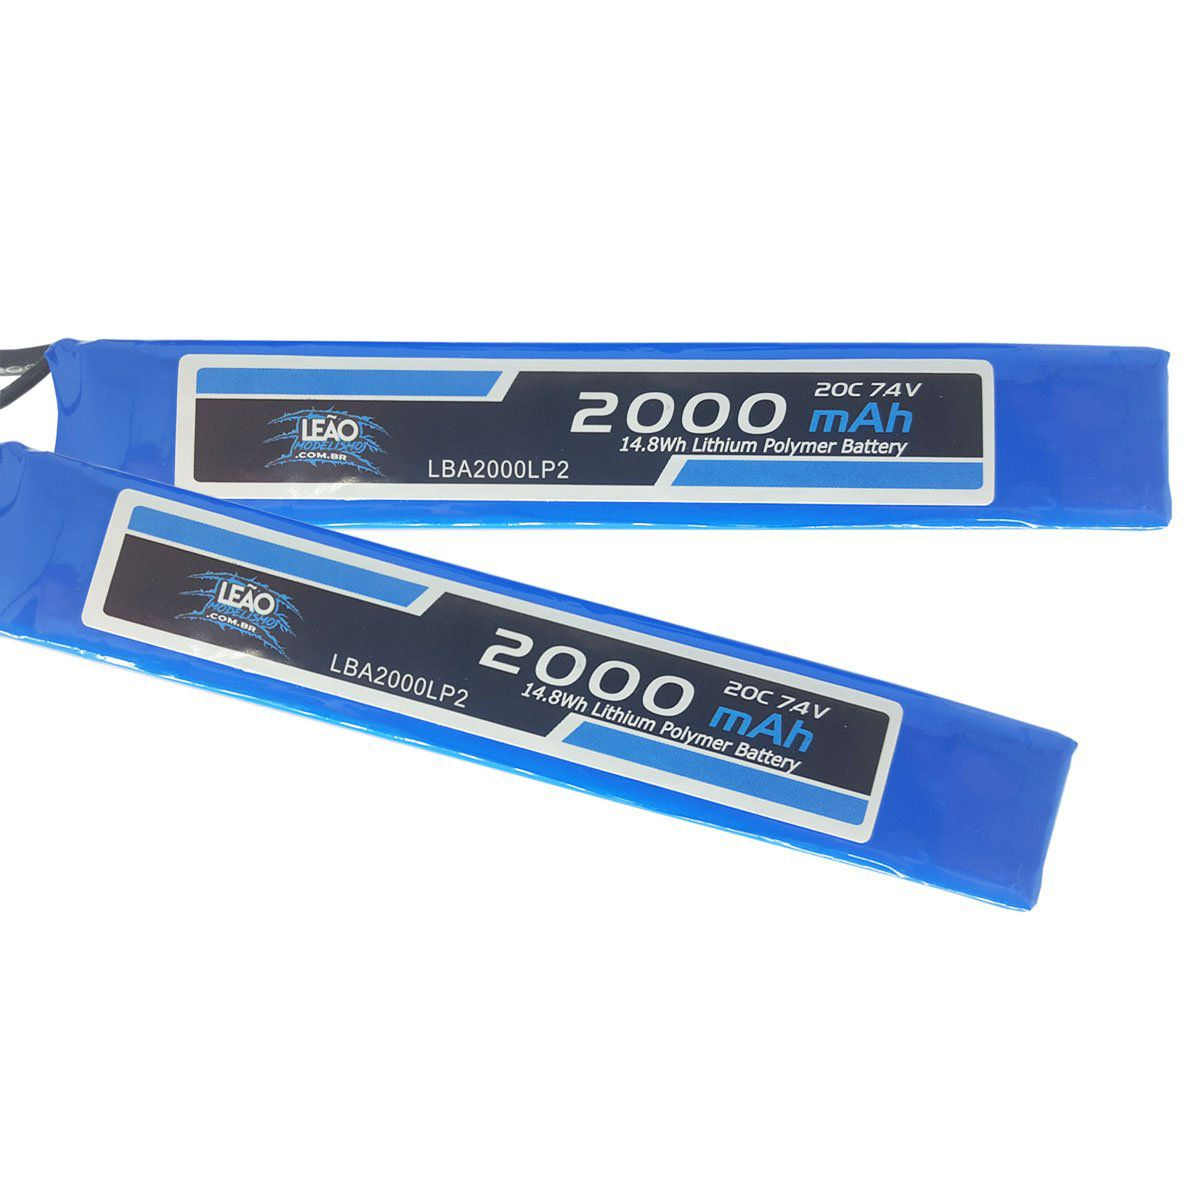 Bateria Lipo Leão Mini Tamiya Plug 7.4V 2000 mAh 20/40C